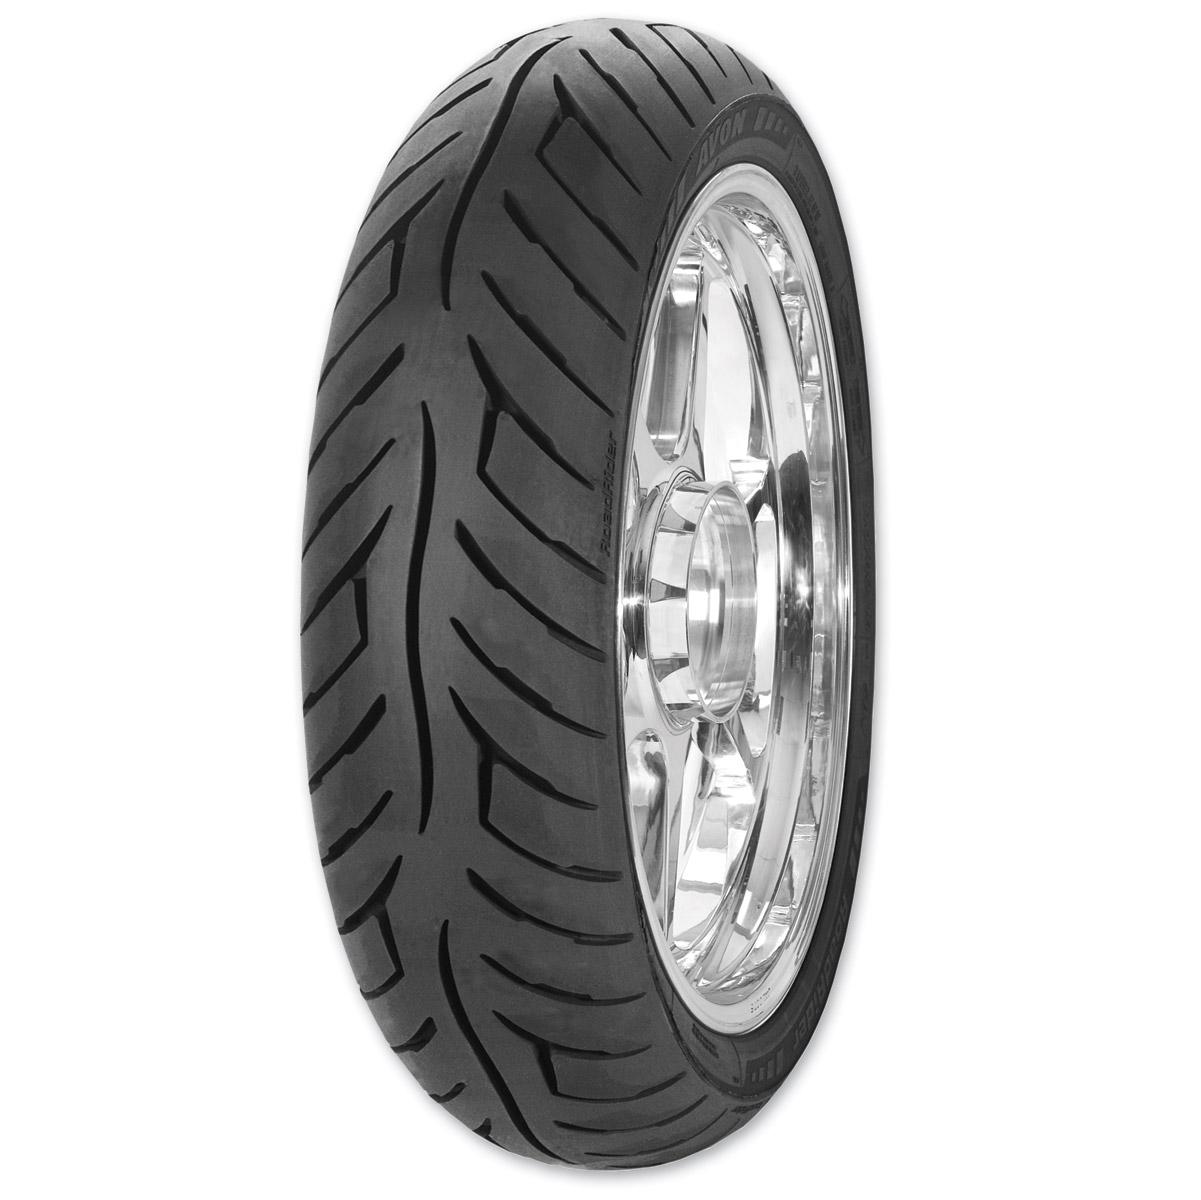 Avon Motorcycle Tires >> Avon Am26 Roadrider Mt90 16 Rear Tire 90000000663